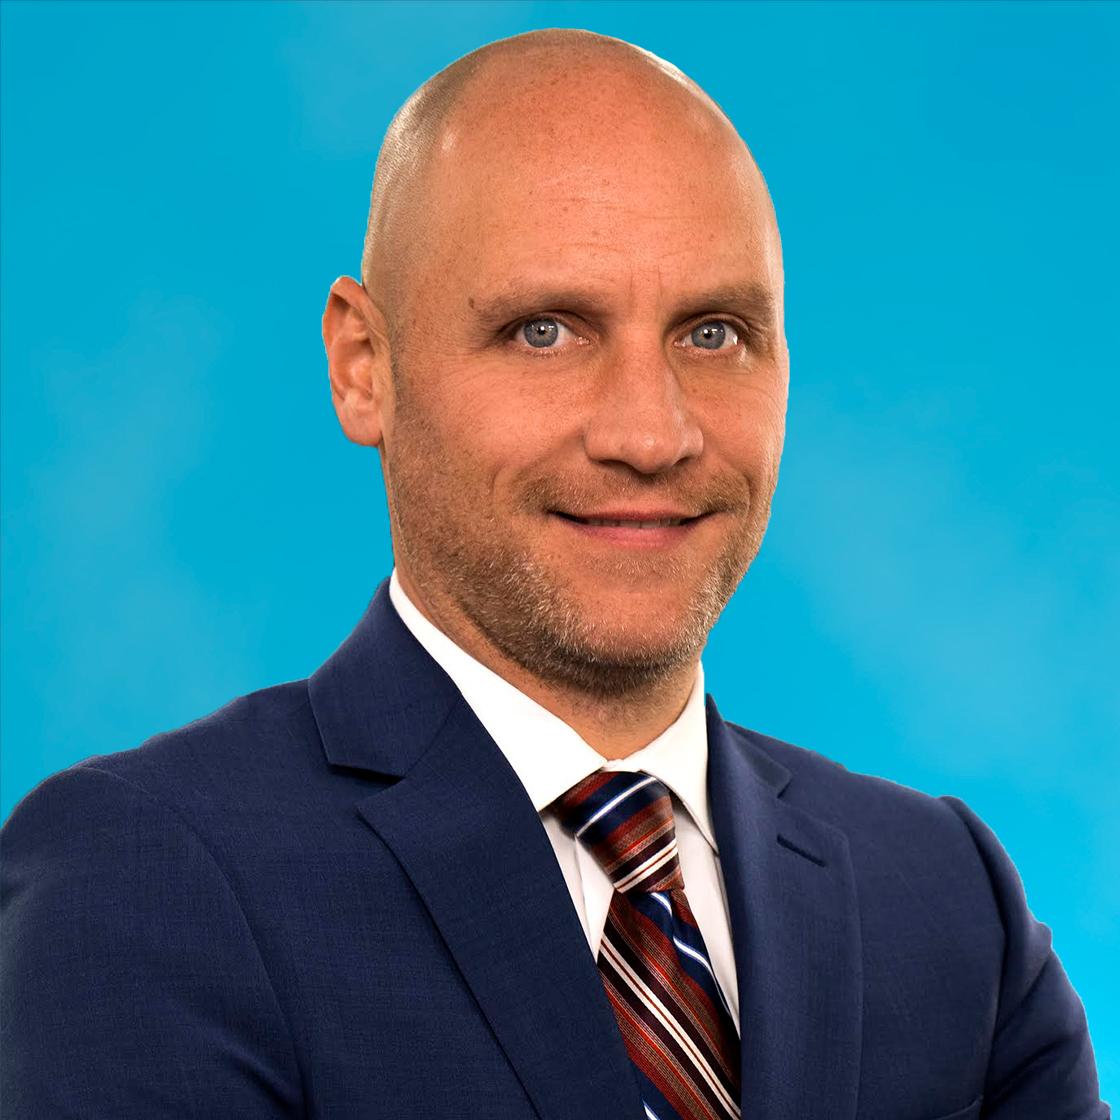 Michael Vurchio